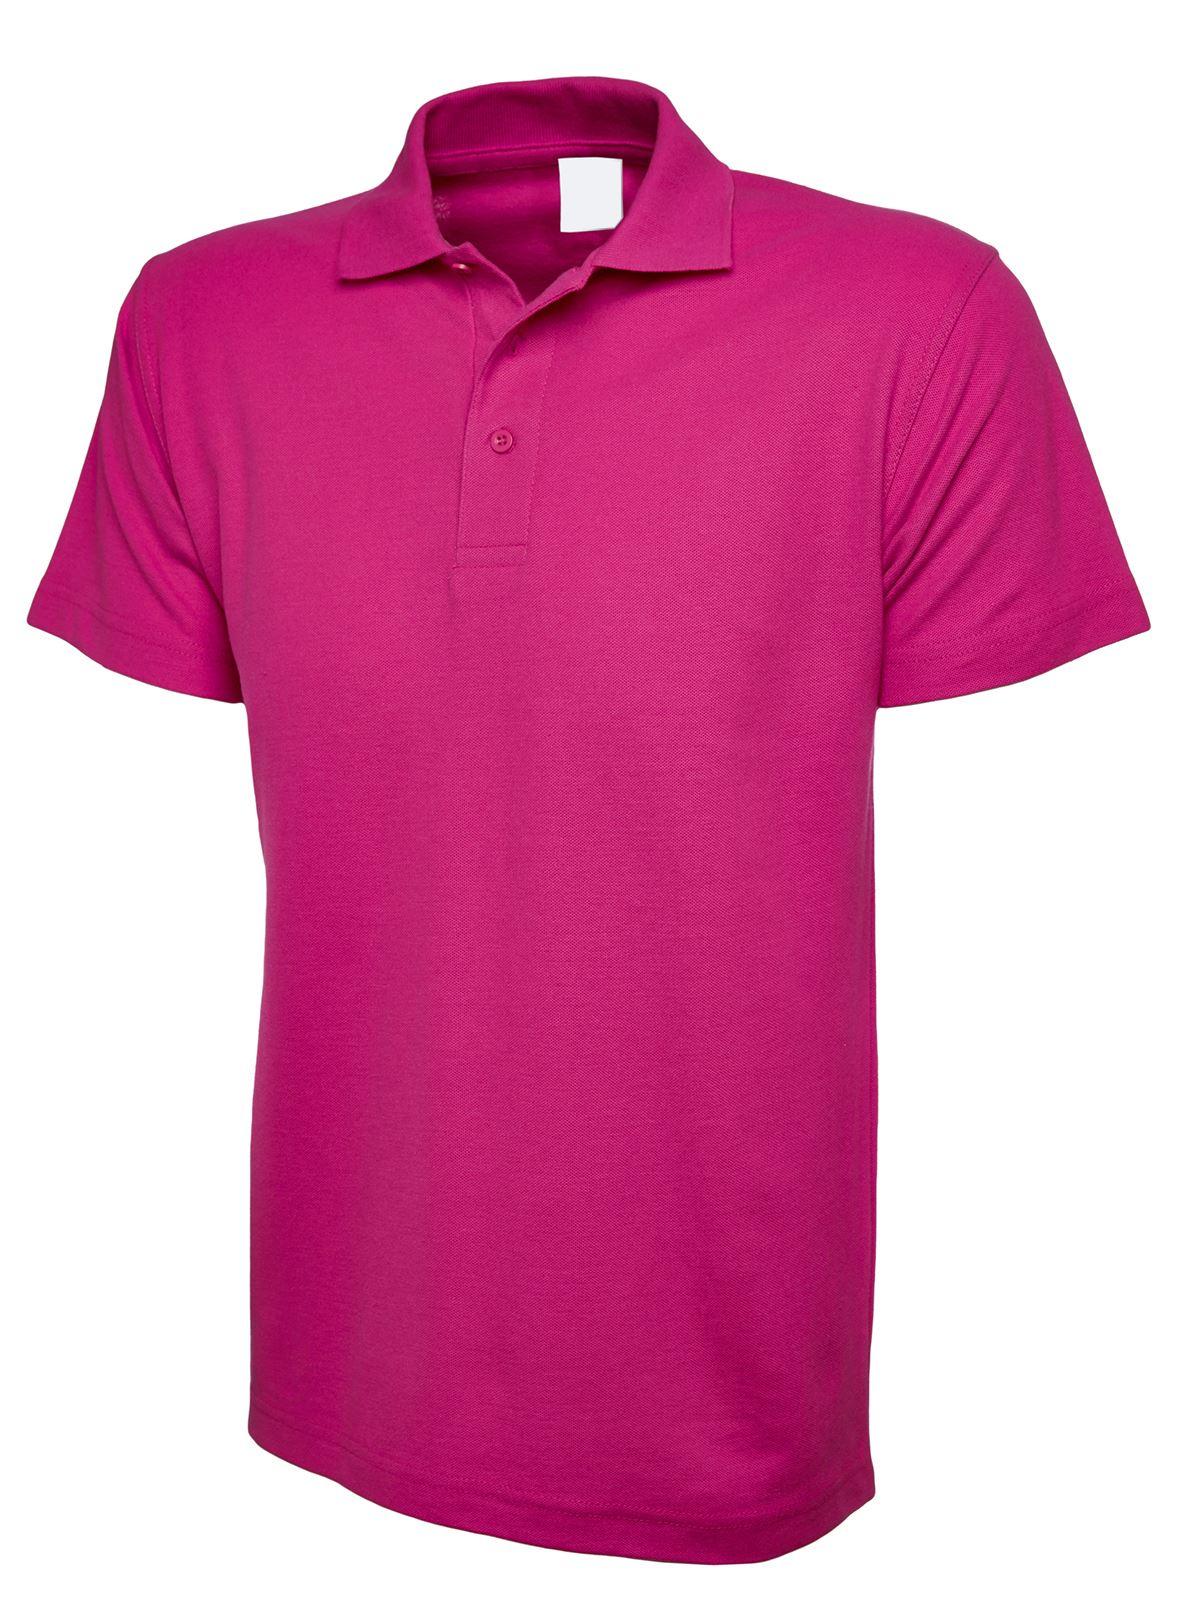 Mens Womens Classic Polo Shirt Blank Plain Short Sleeve